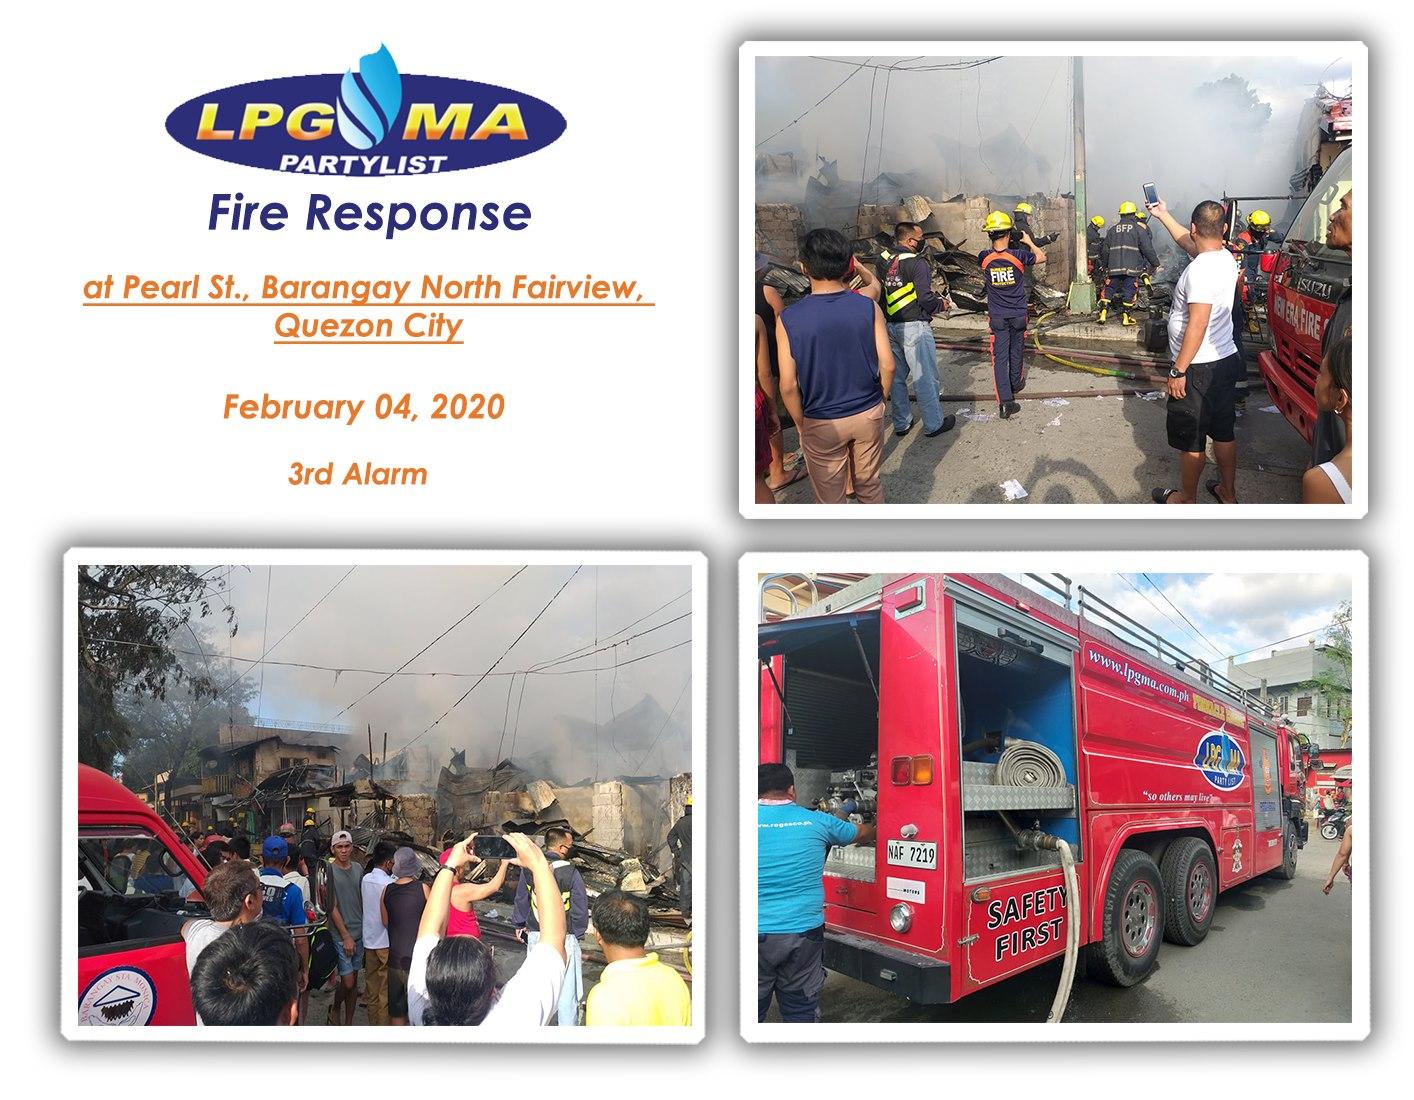 LPGMA Fire Response in Fairview, Quezon City